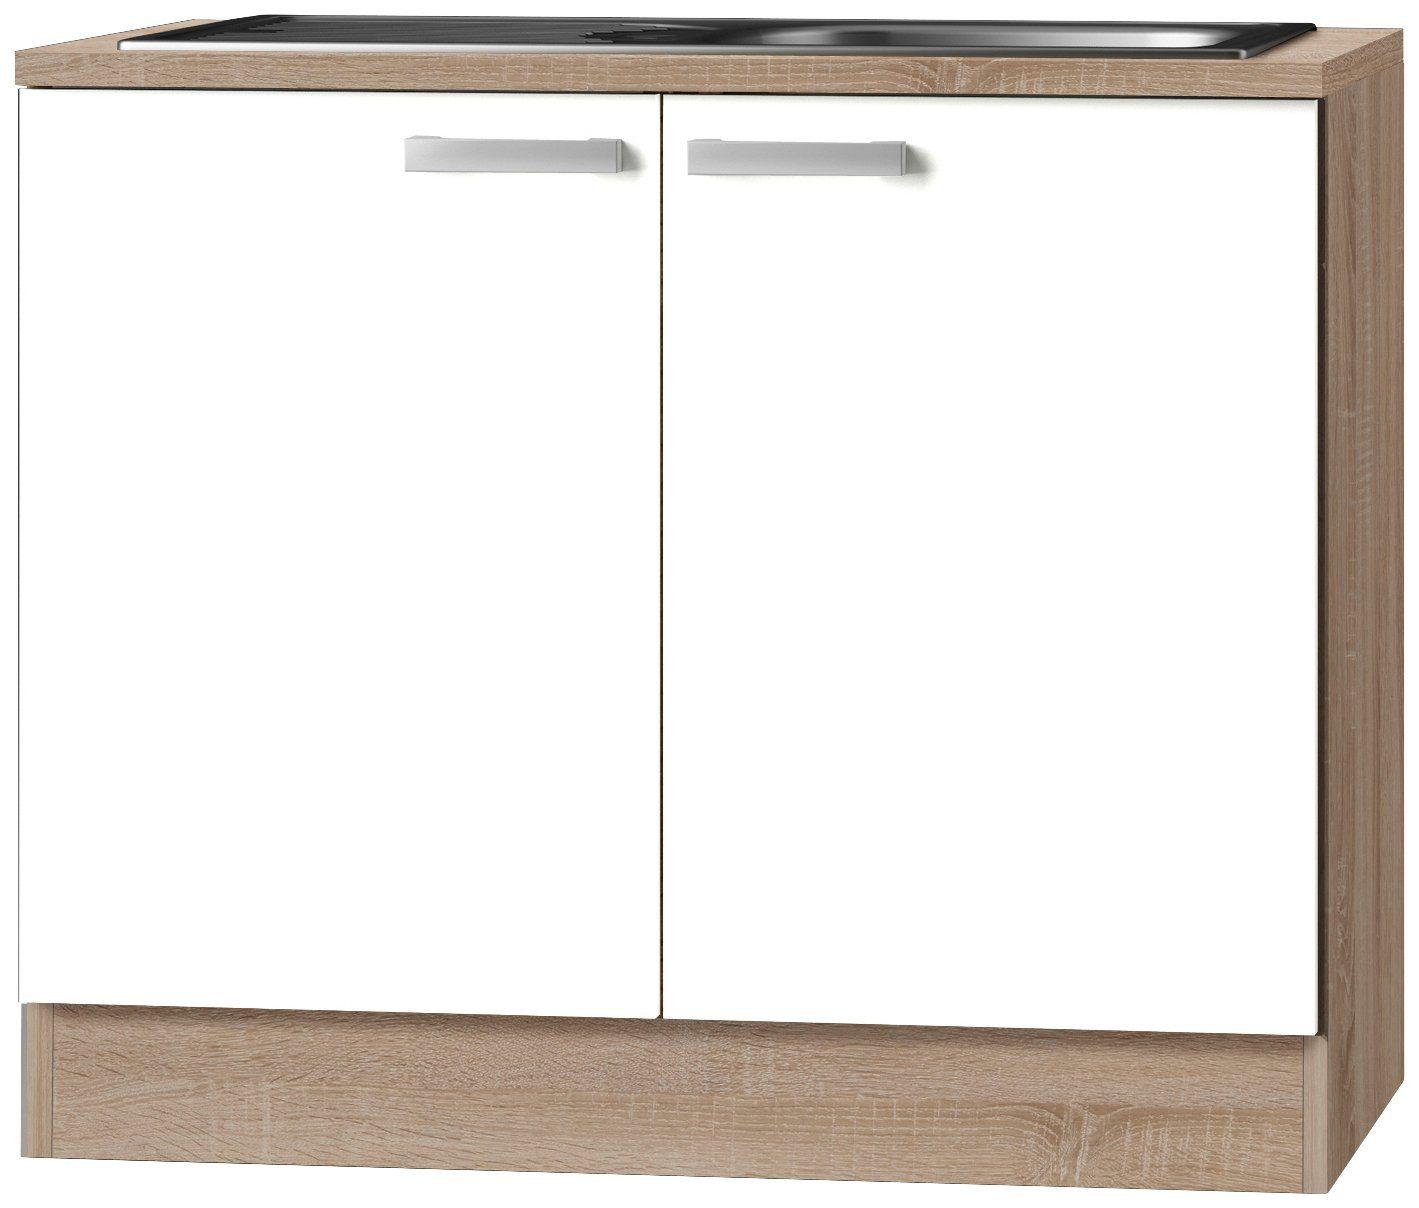 OPTIFIT Spülenschrank »OPTIkult Zamora«, Breite 100 cm